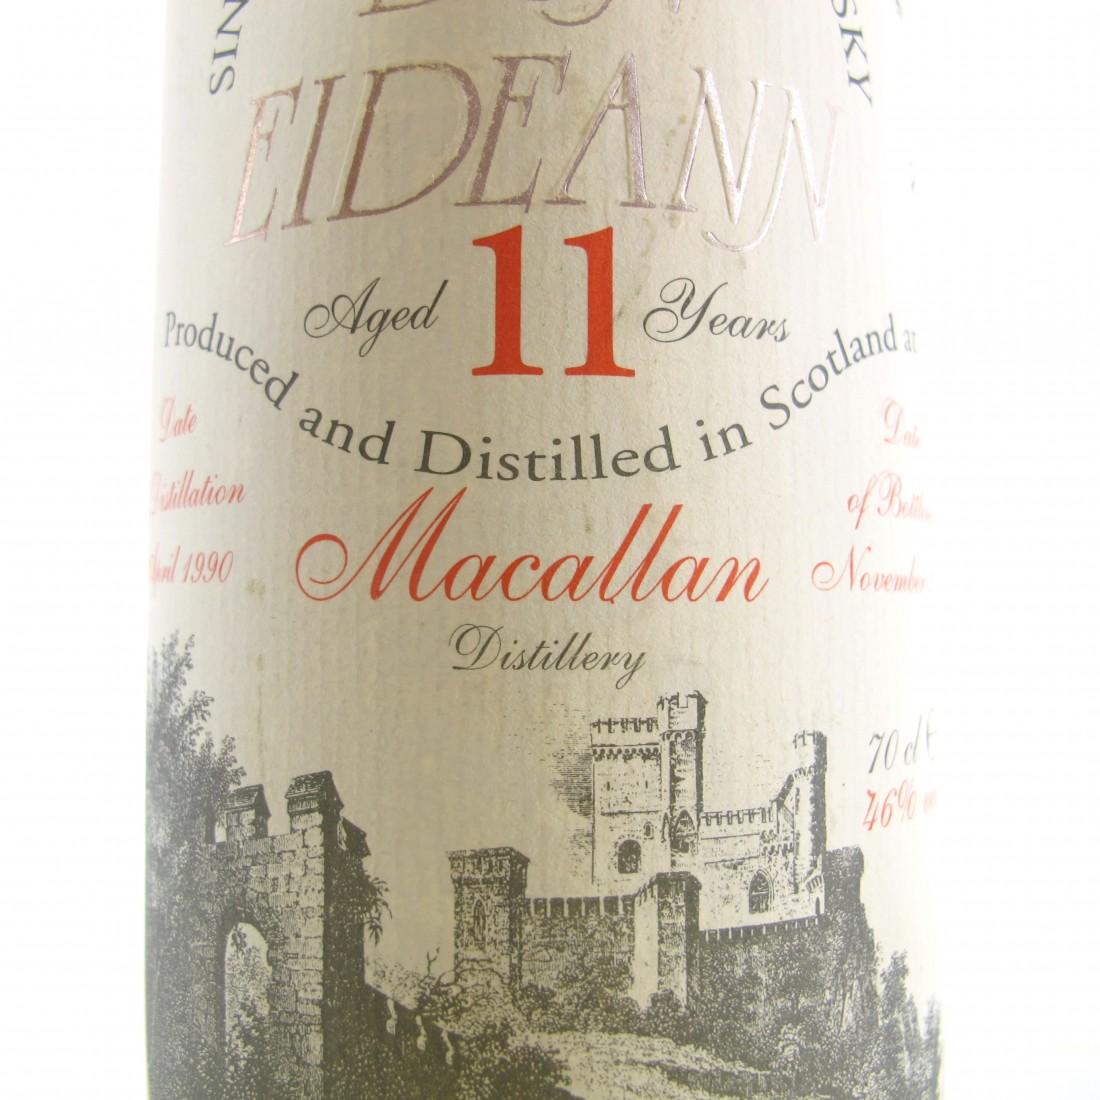 Macallan 1990 Dun Eideann 11 Year Old